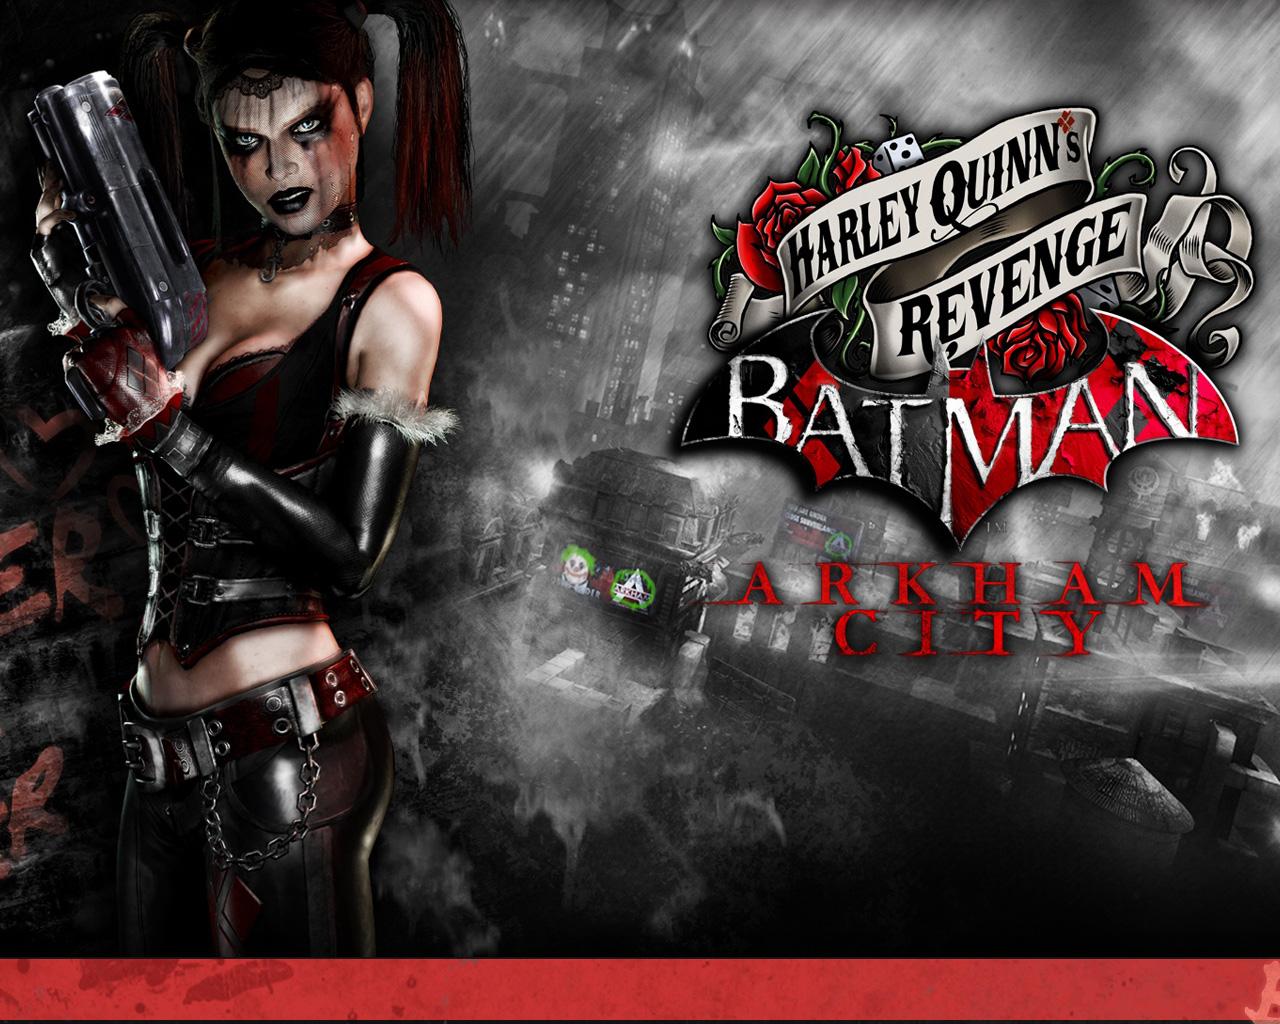 Batman Arkham City Wallpaper in 1280x1024 1280x1024